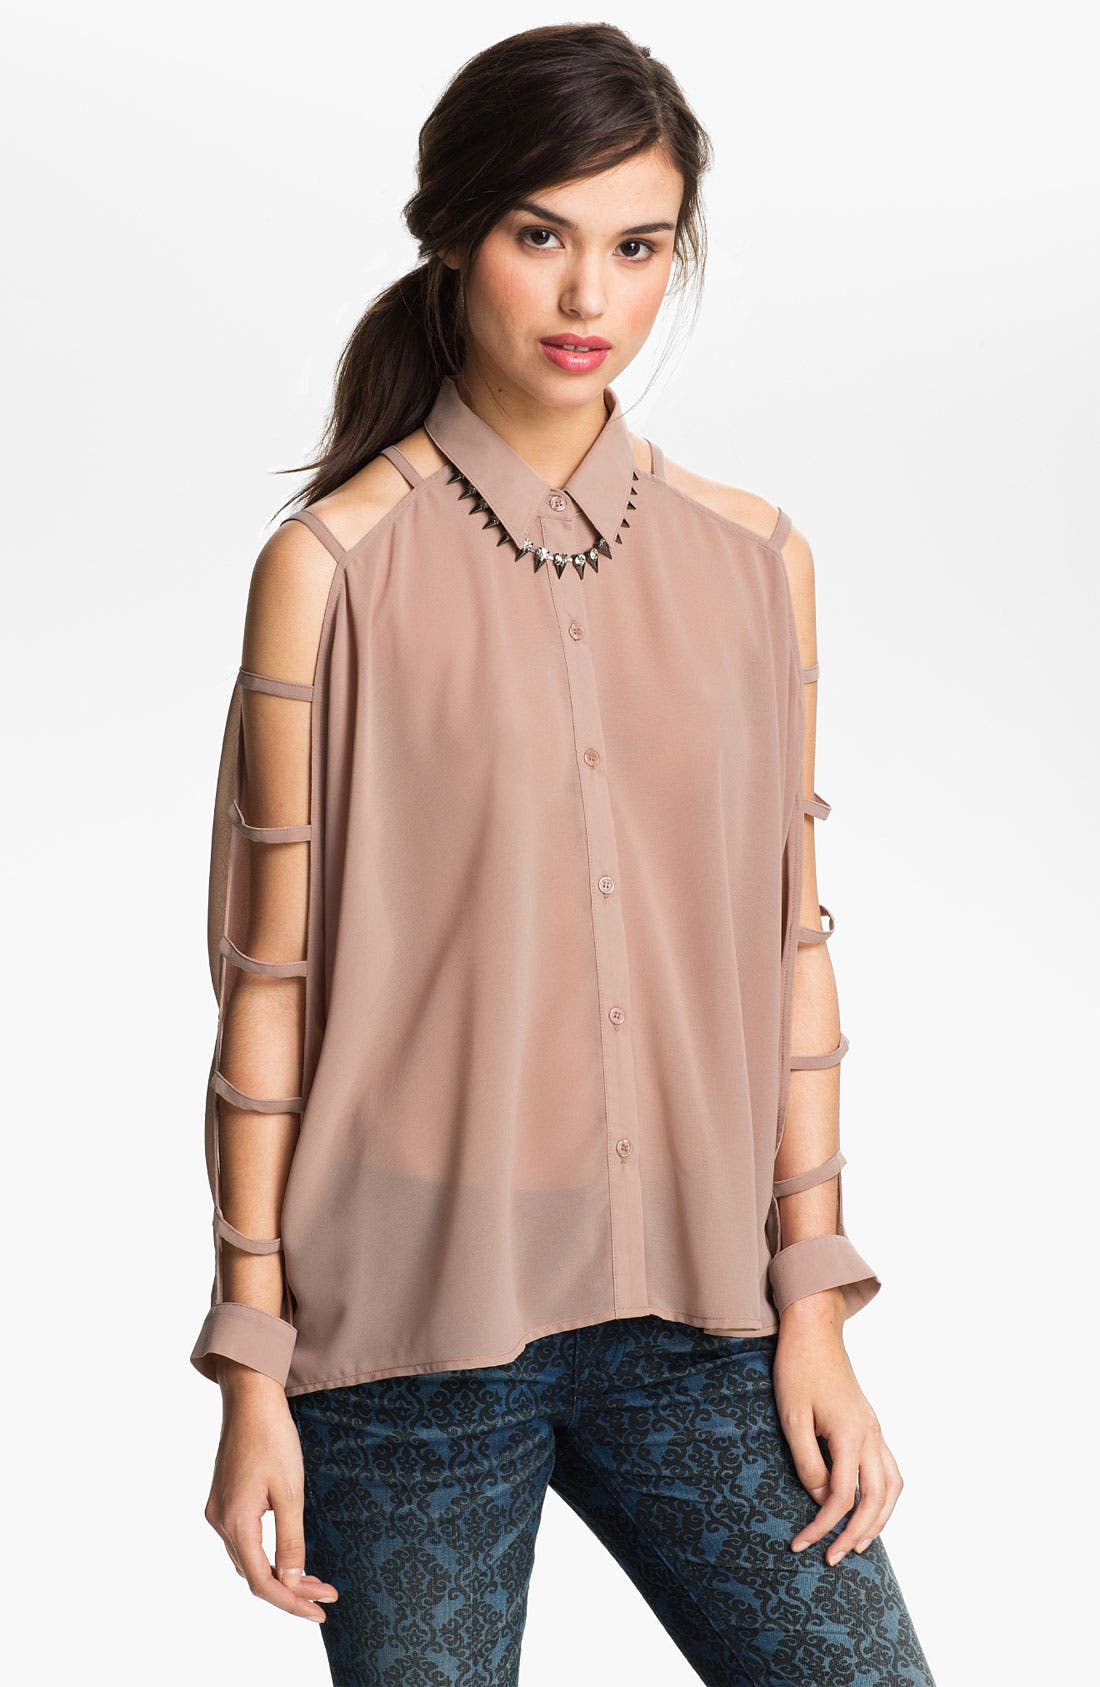 Alternate Image 1 Selected - Lush Ladder Sleeve Shirt (Juniors)